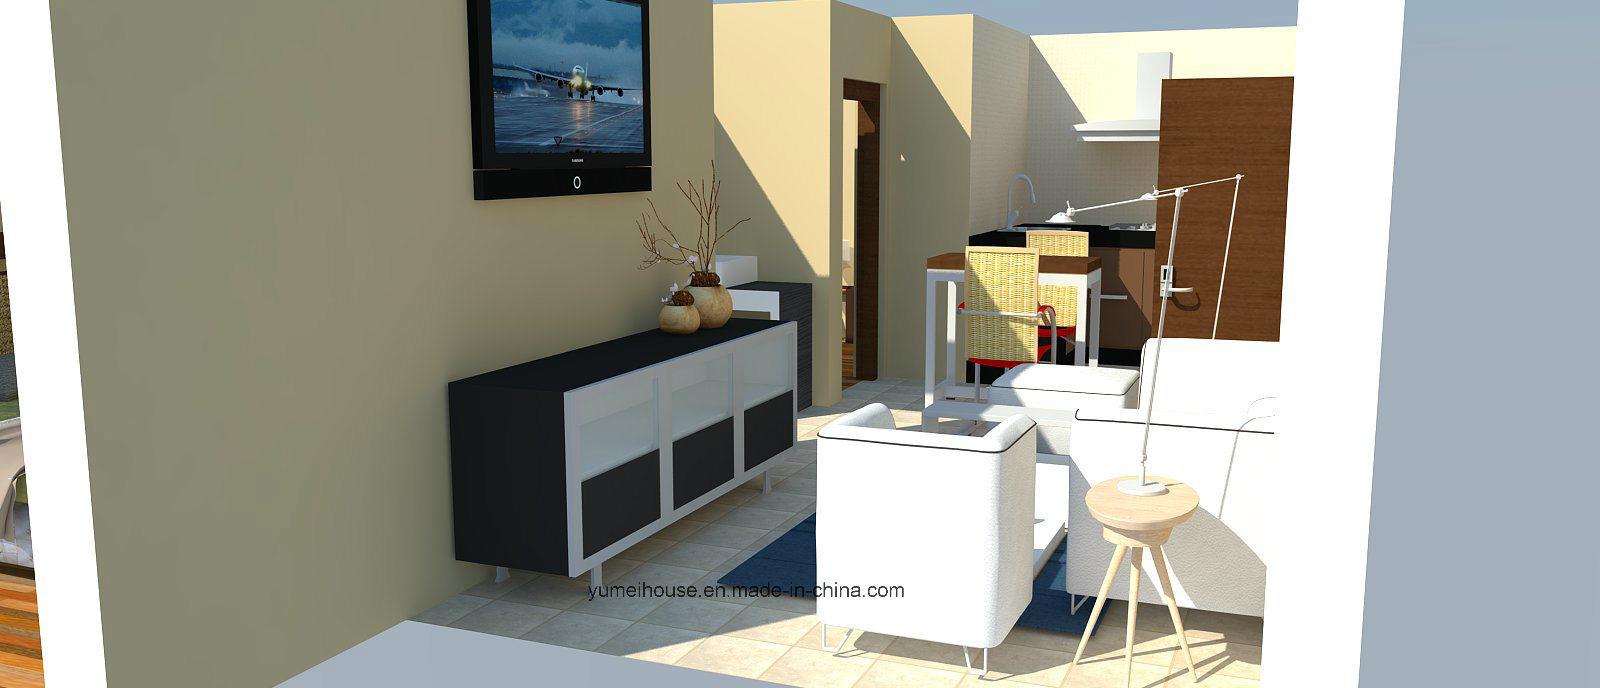 Light Steel Prefabricated Small Villa House